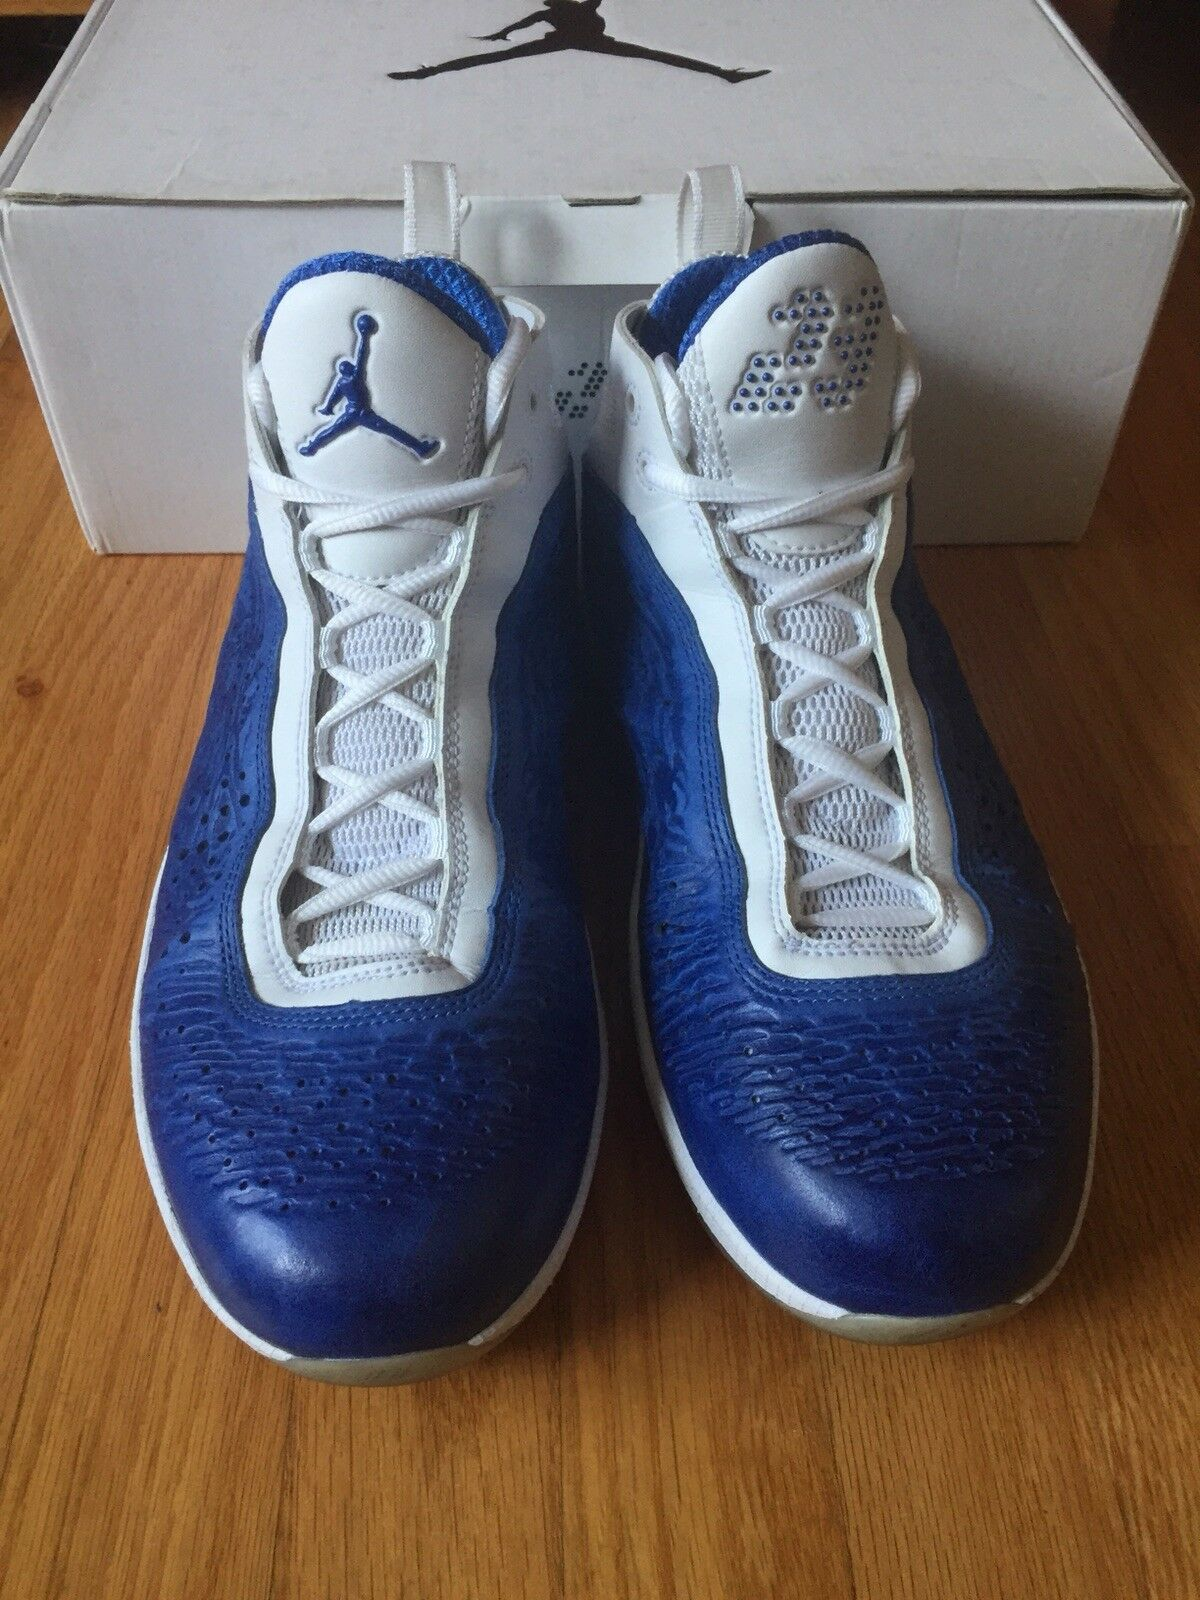 Air Jordan 2011 XX6 26 Original All Star East Size White/royal 10 436771 103